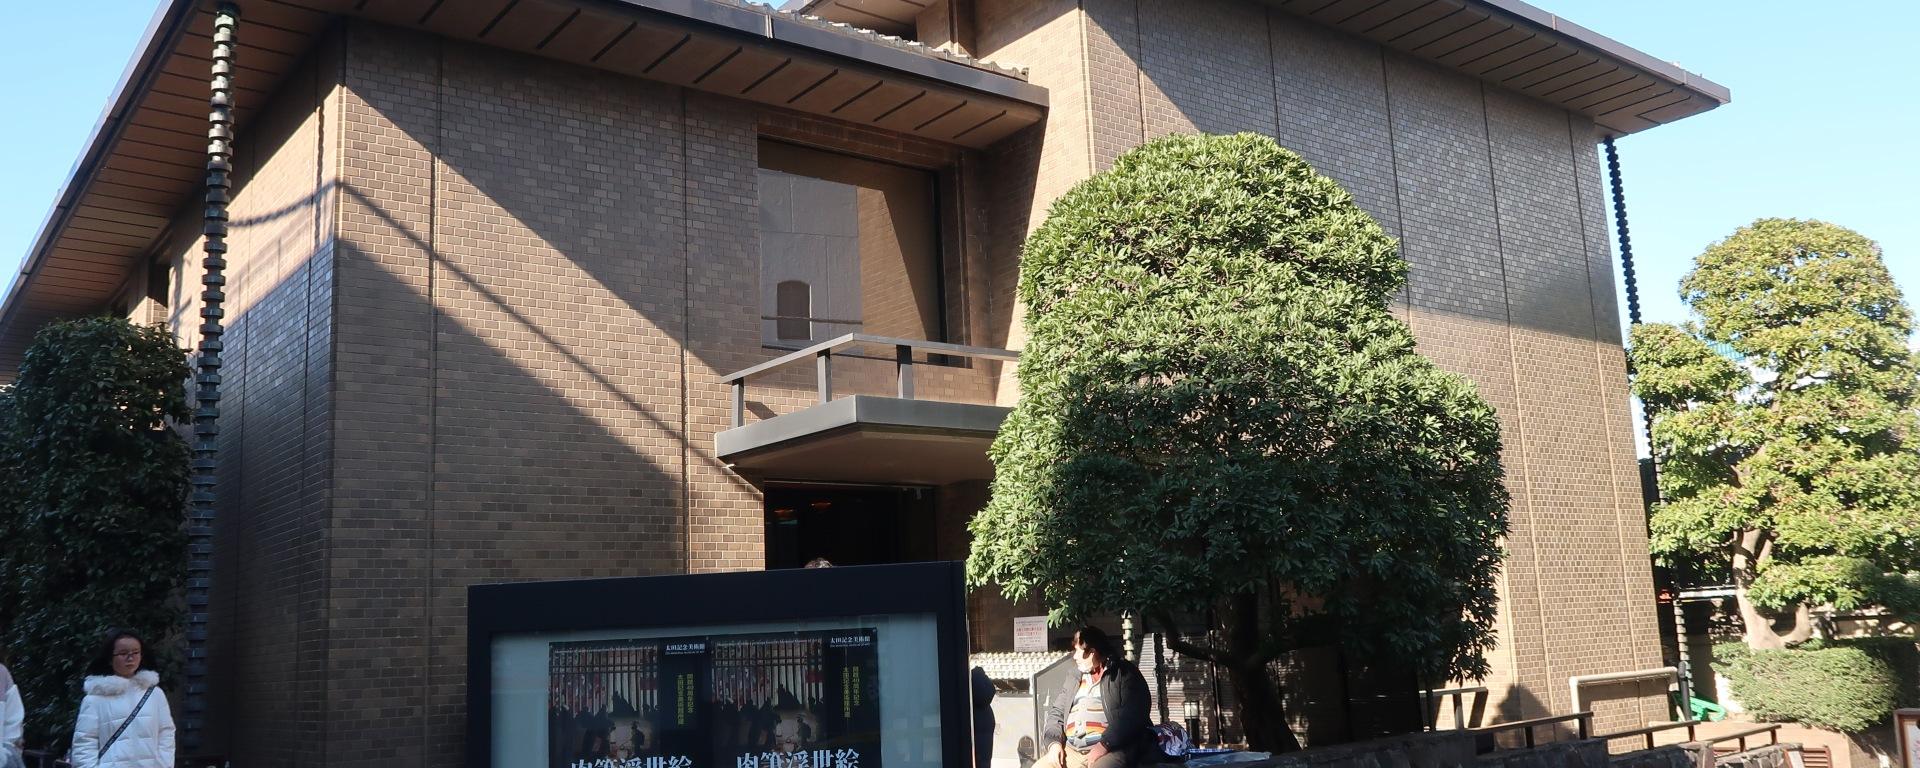 Ota Memorial Museum of Art, Ukiyoe collection museum